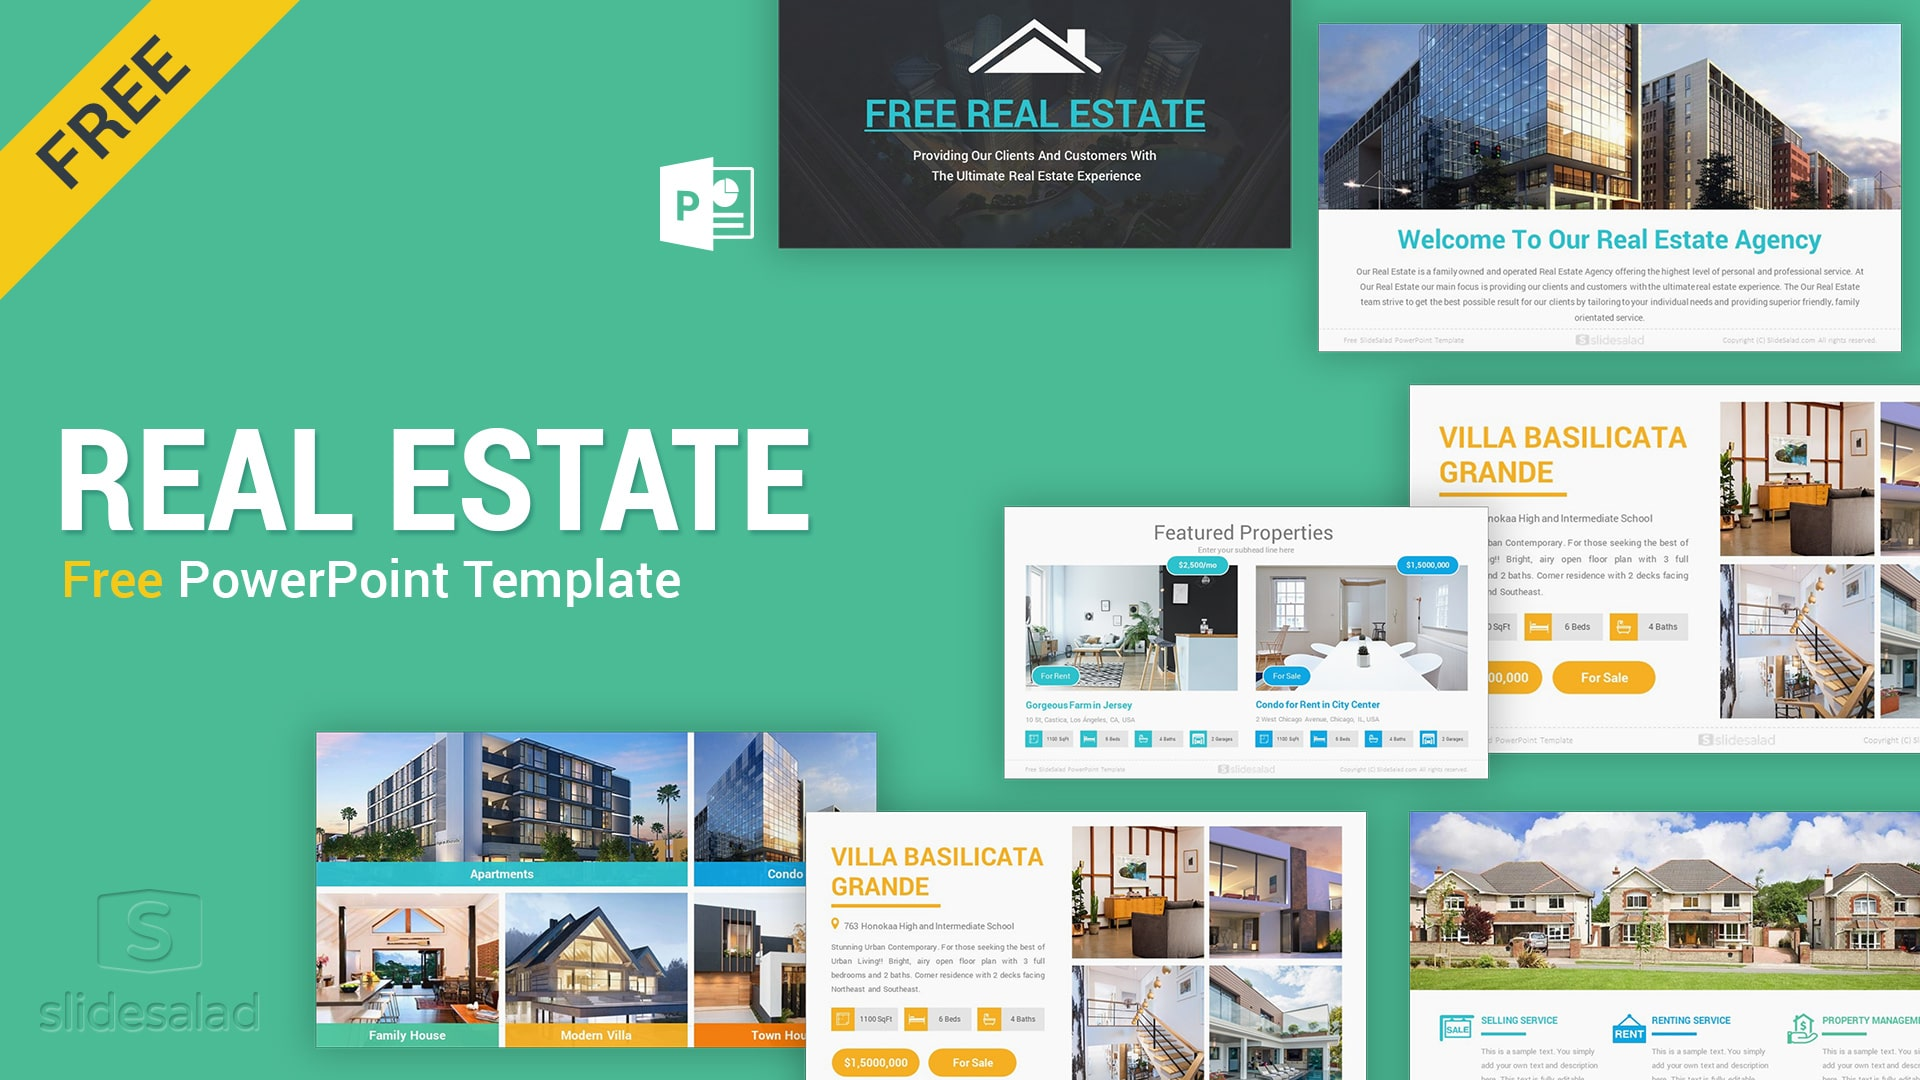 Free Real Estate Powerpoint Template Design Slidesalad